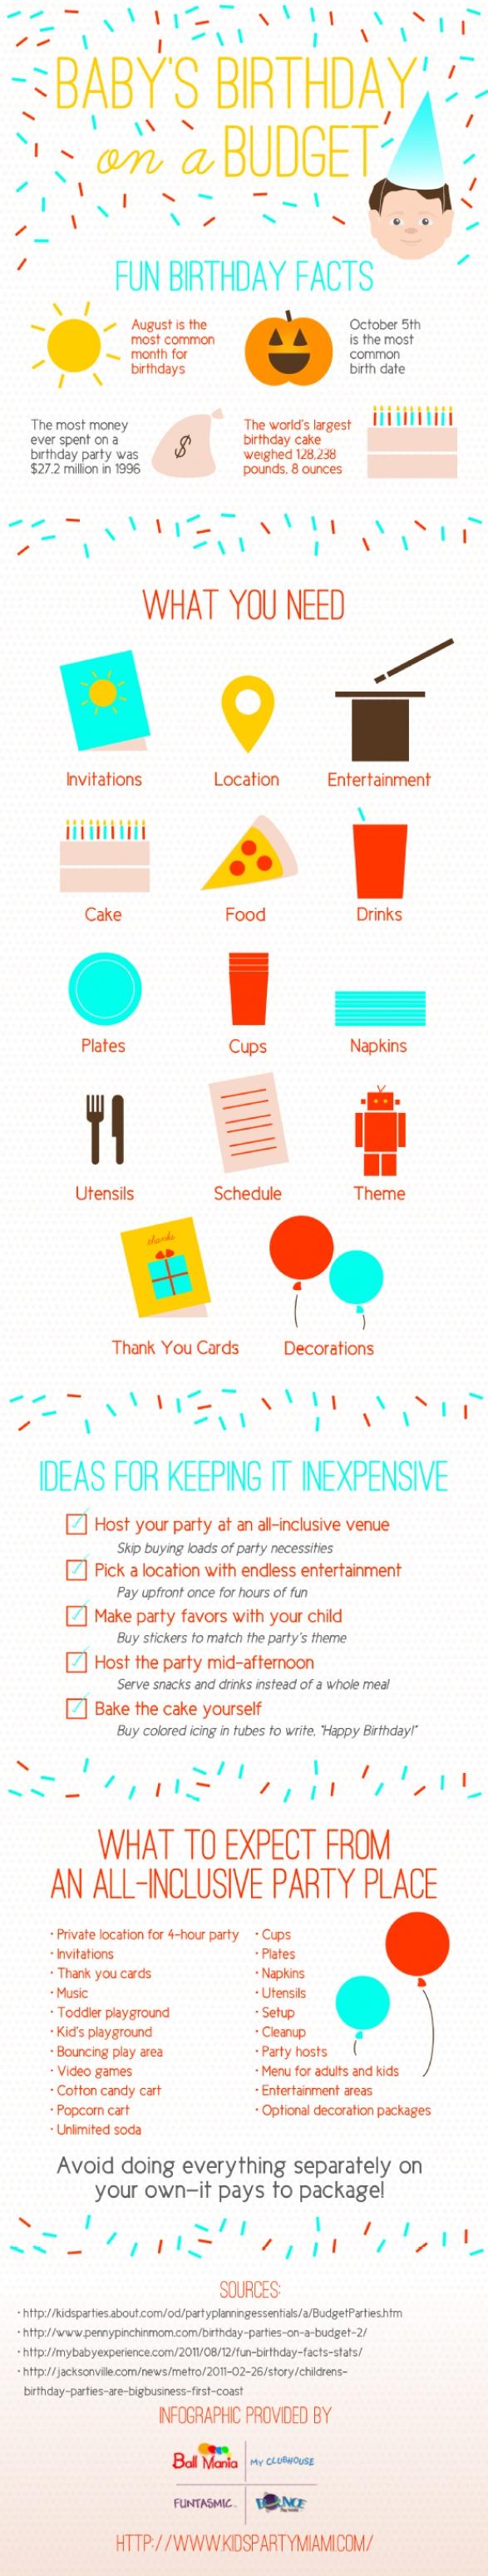 DIY Birthdays on a Budget #Infographic